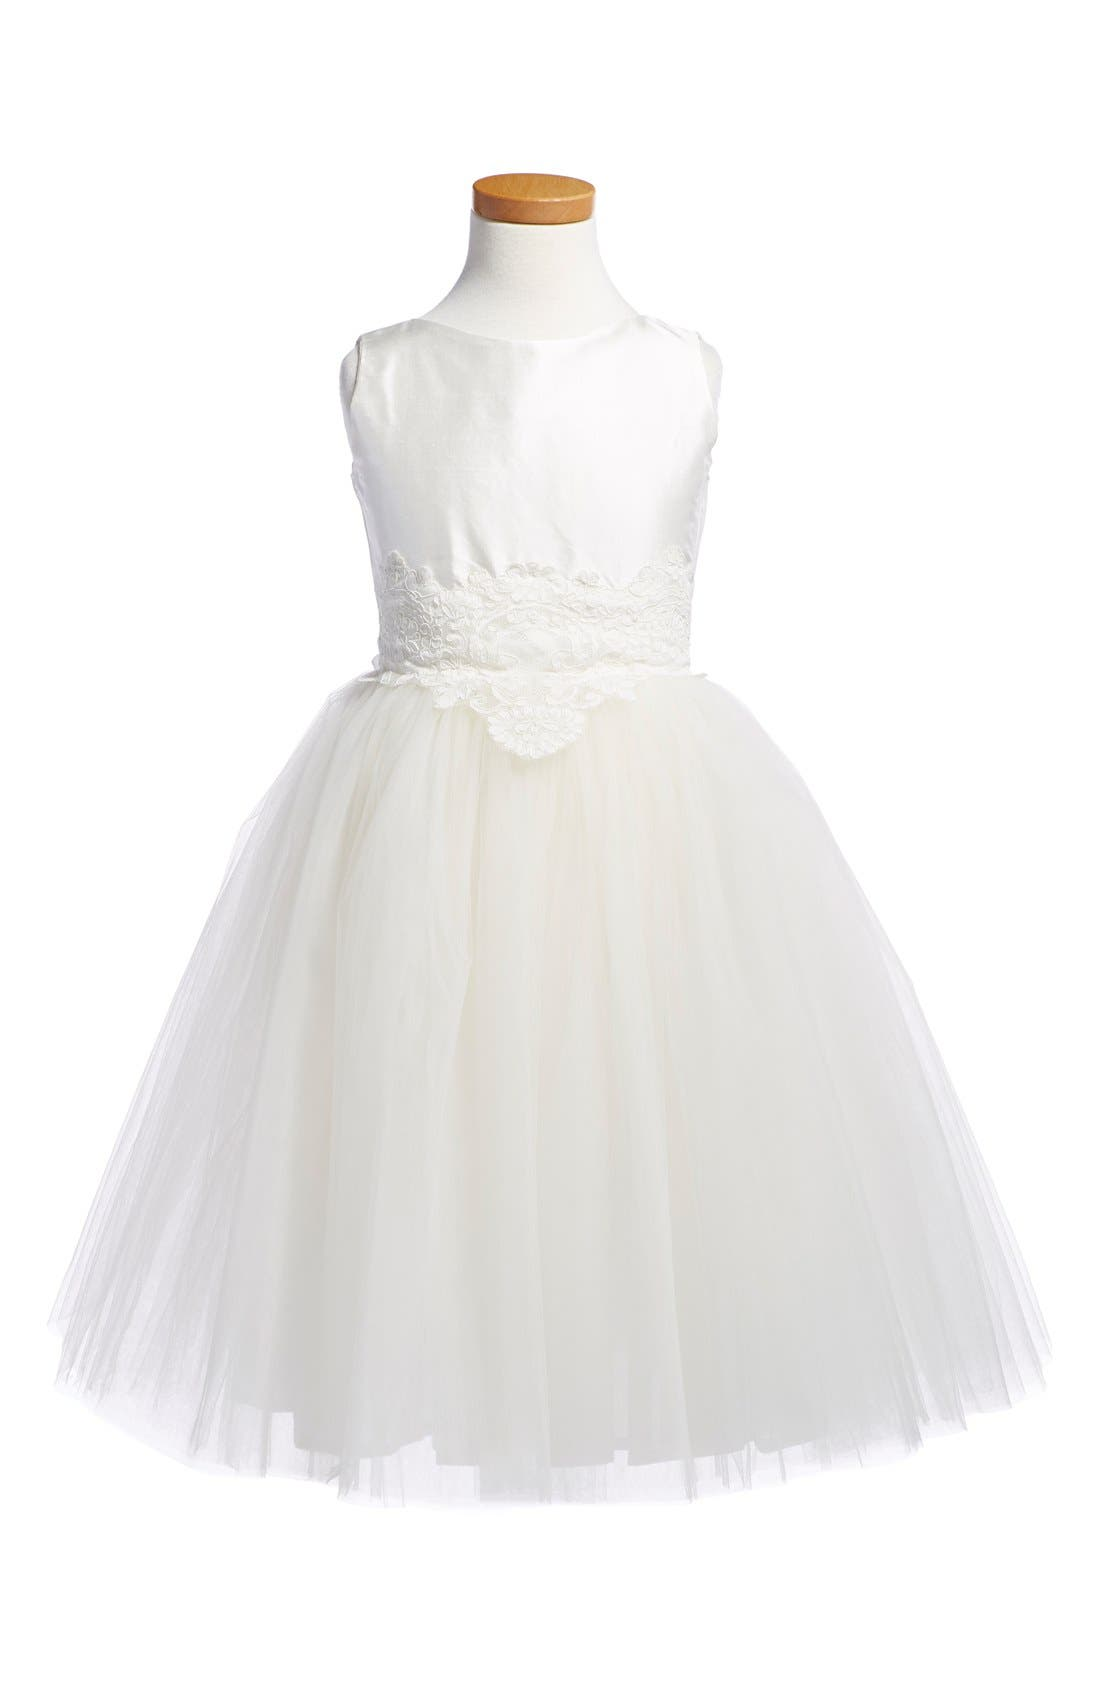 'Enchanting' Sleeveless Taffeta Dress,                         Main,                         color, 900